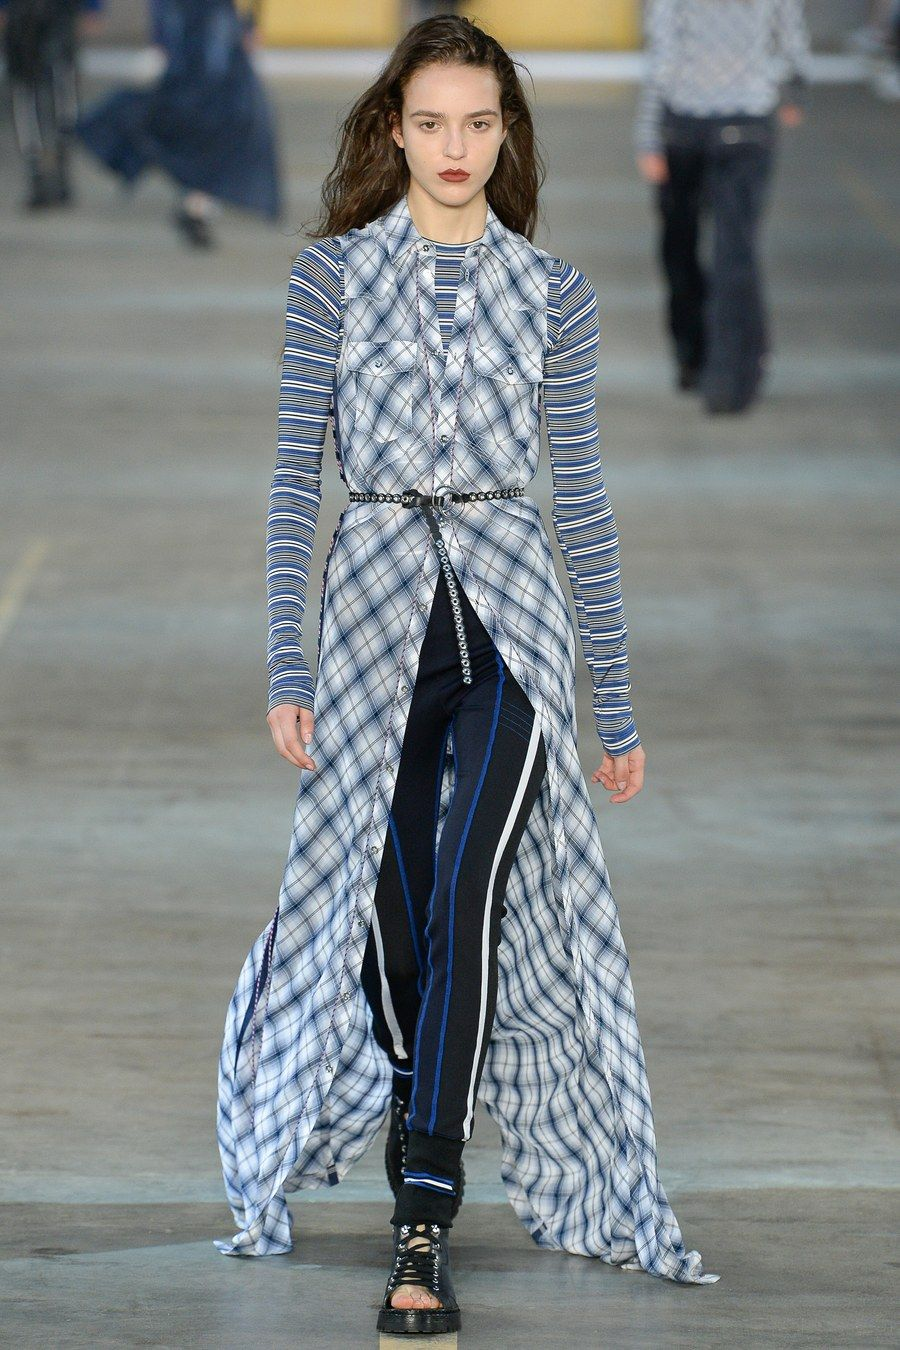 Fashion week Black diesel gold spring runway for lady